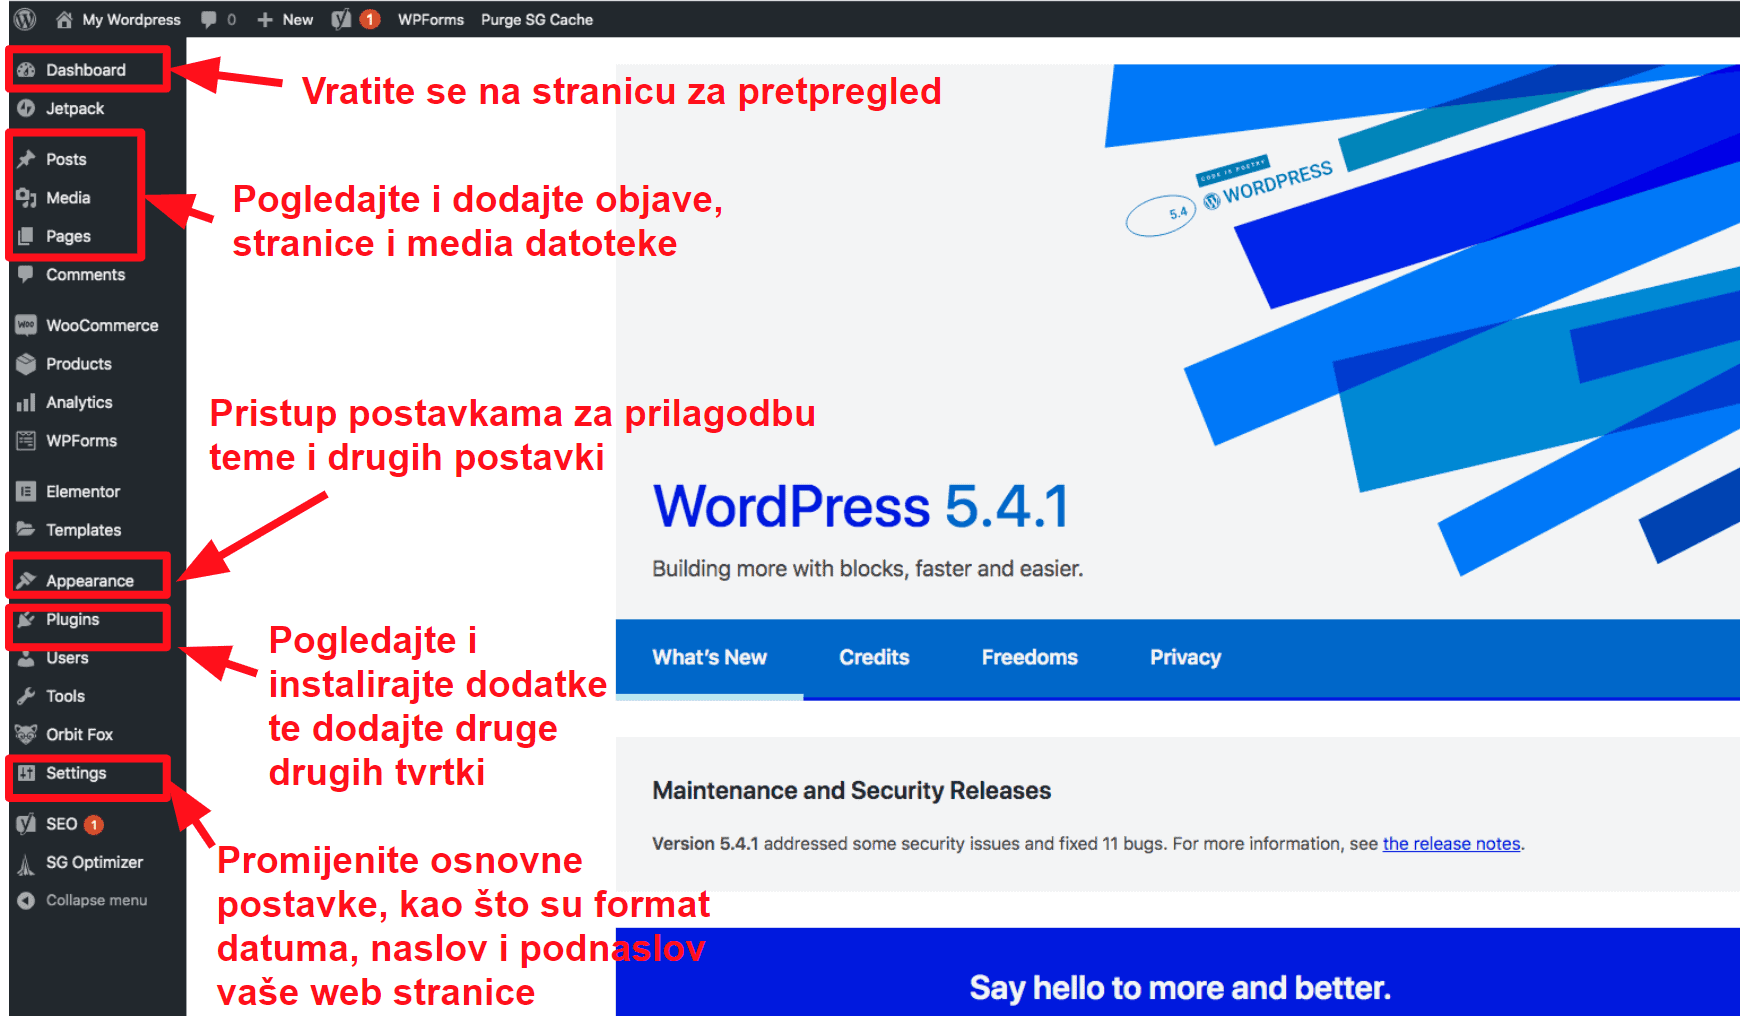 The WordPress dashboard HR16